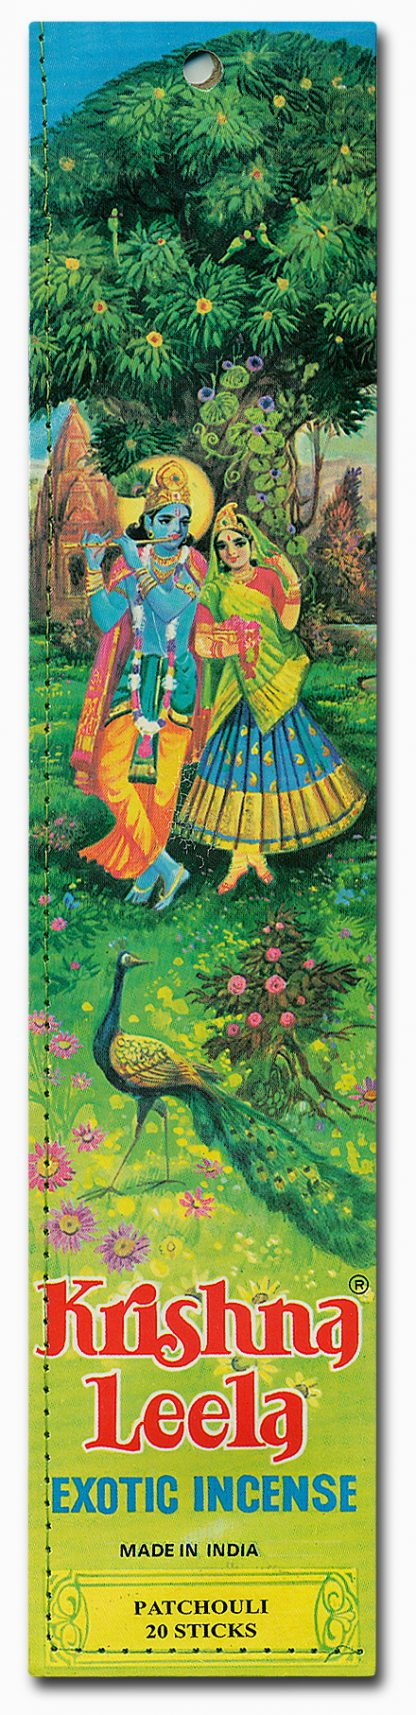 Krishna Leela Patchouly 93 4802 08 G